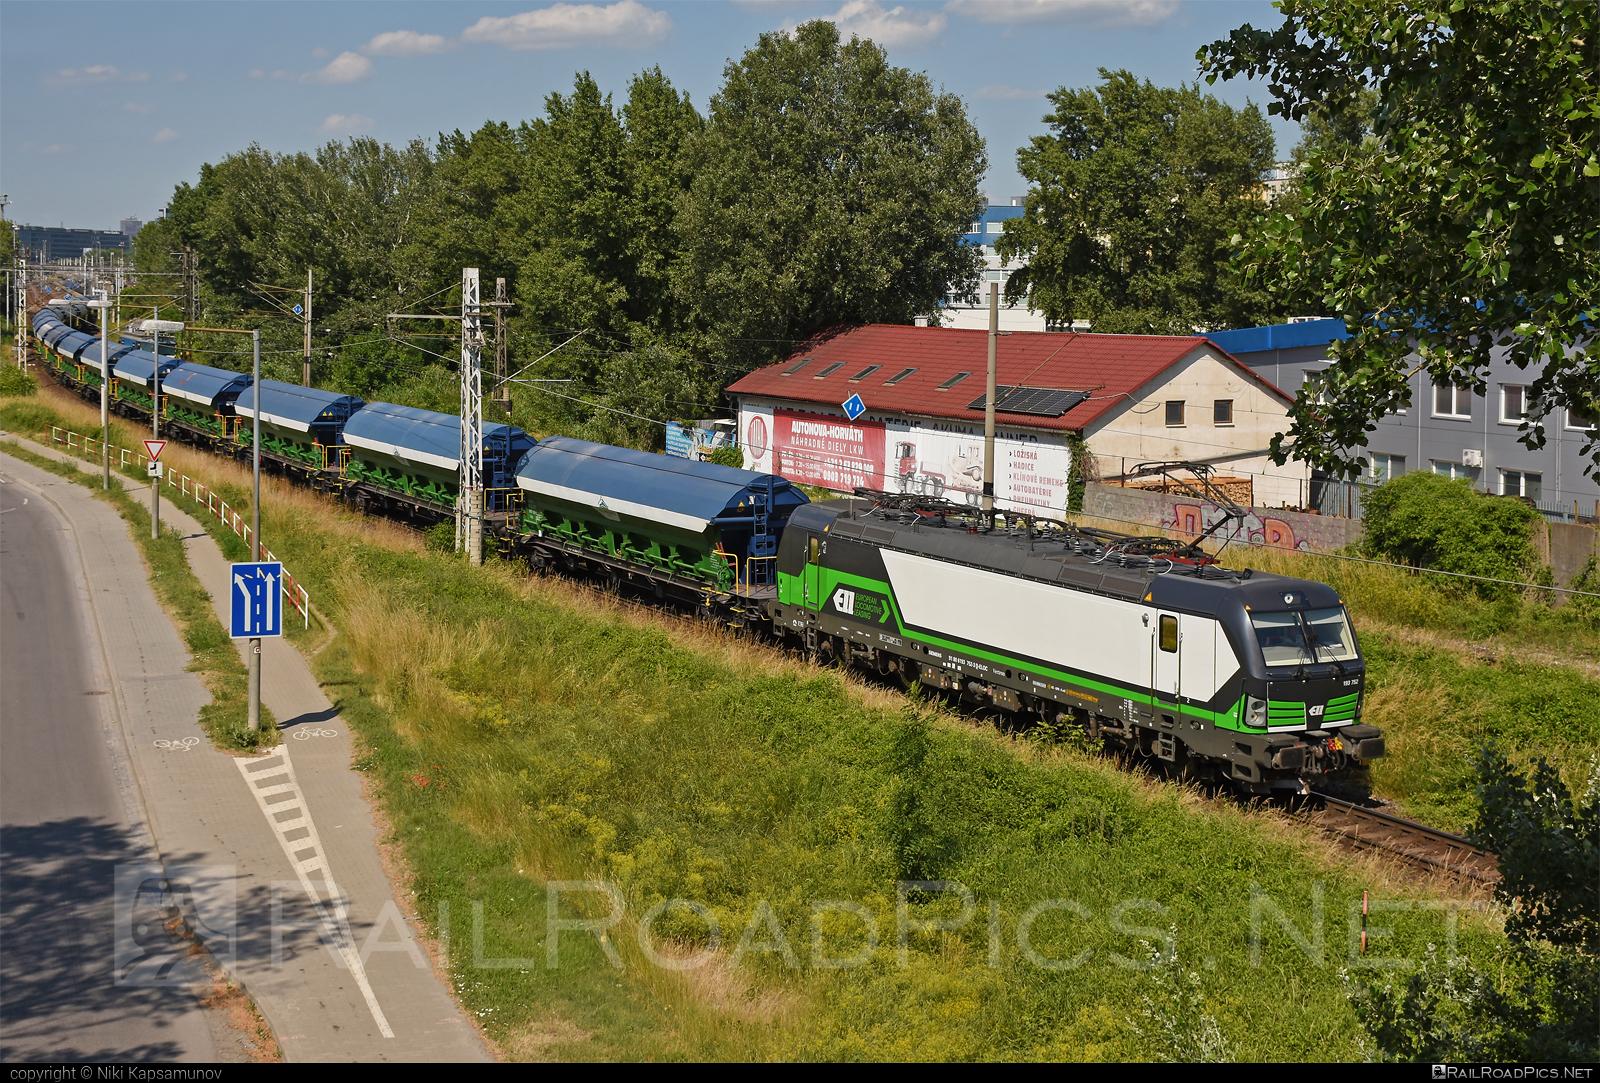 Siemens Vectron MS - 193 752 operated by Salzburger Eisenbahn Transportlogistik GmbH #SalzburgerEisenbahnTransportlogistik #SalzburgerEisenbahnTransportlogistikGmbH #ell #ellgermany #eloc #europeanlocomotiveleasing #hopperwagon #setg #siemens #siemensvectron #siemensvectronms #tads #vectron #vectronms